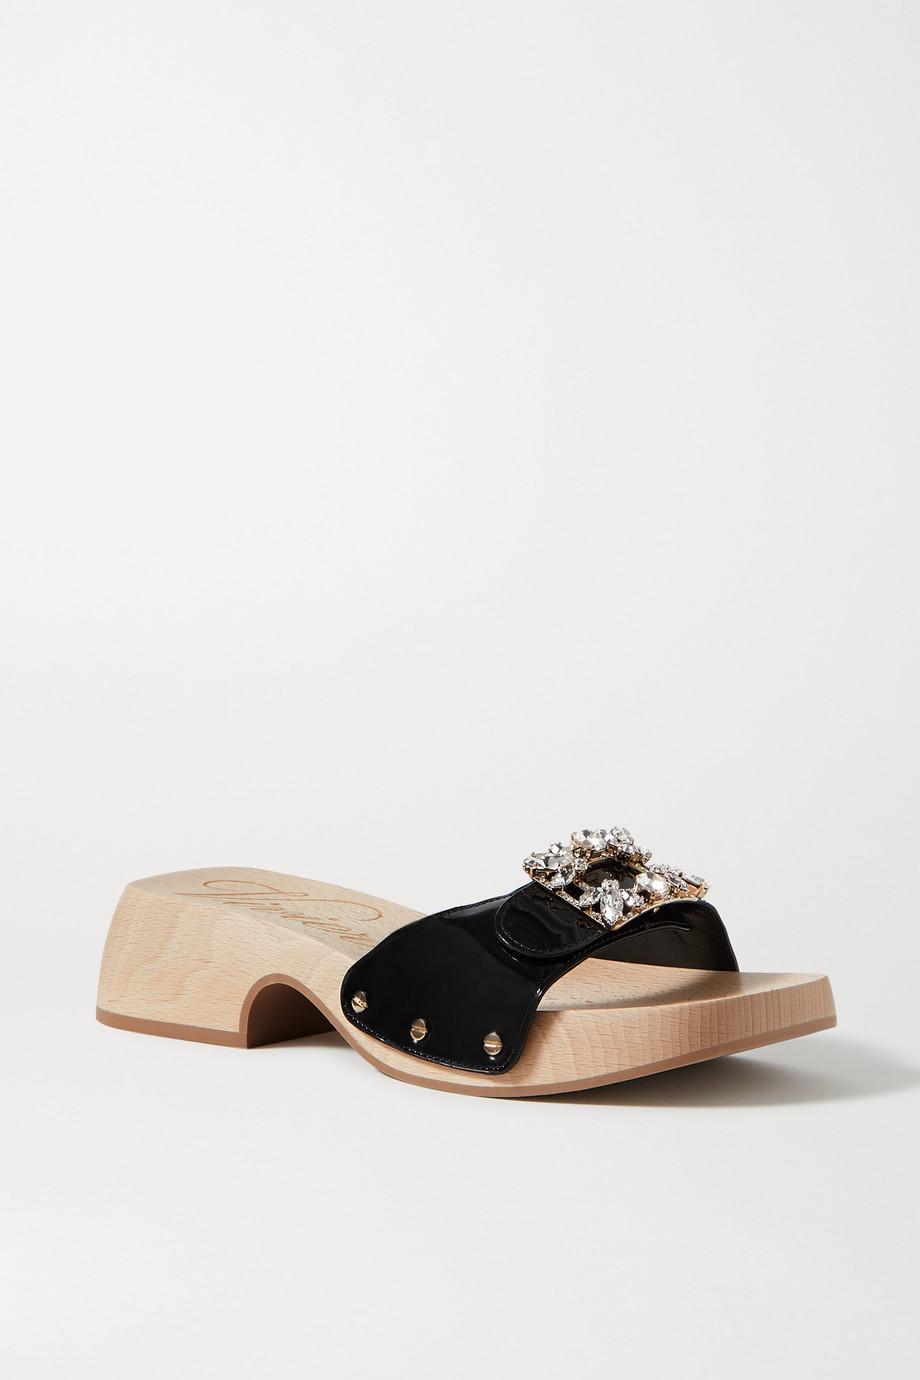 Roger Vivier Viv 水晶缀饰漆皮穆勒鞋